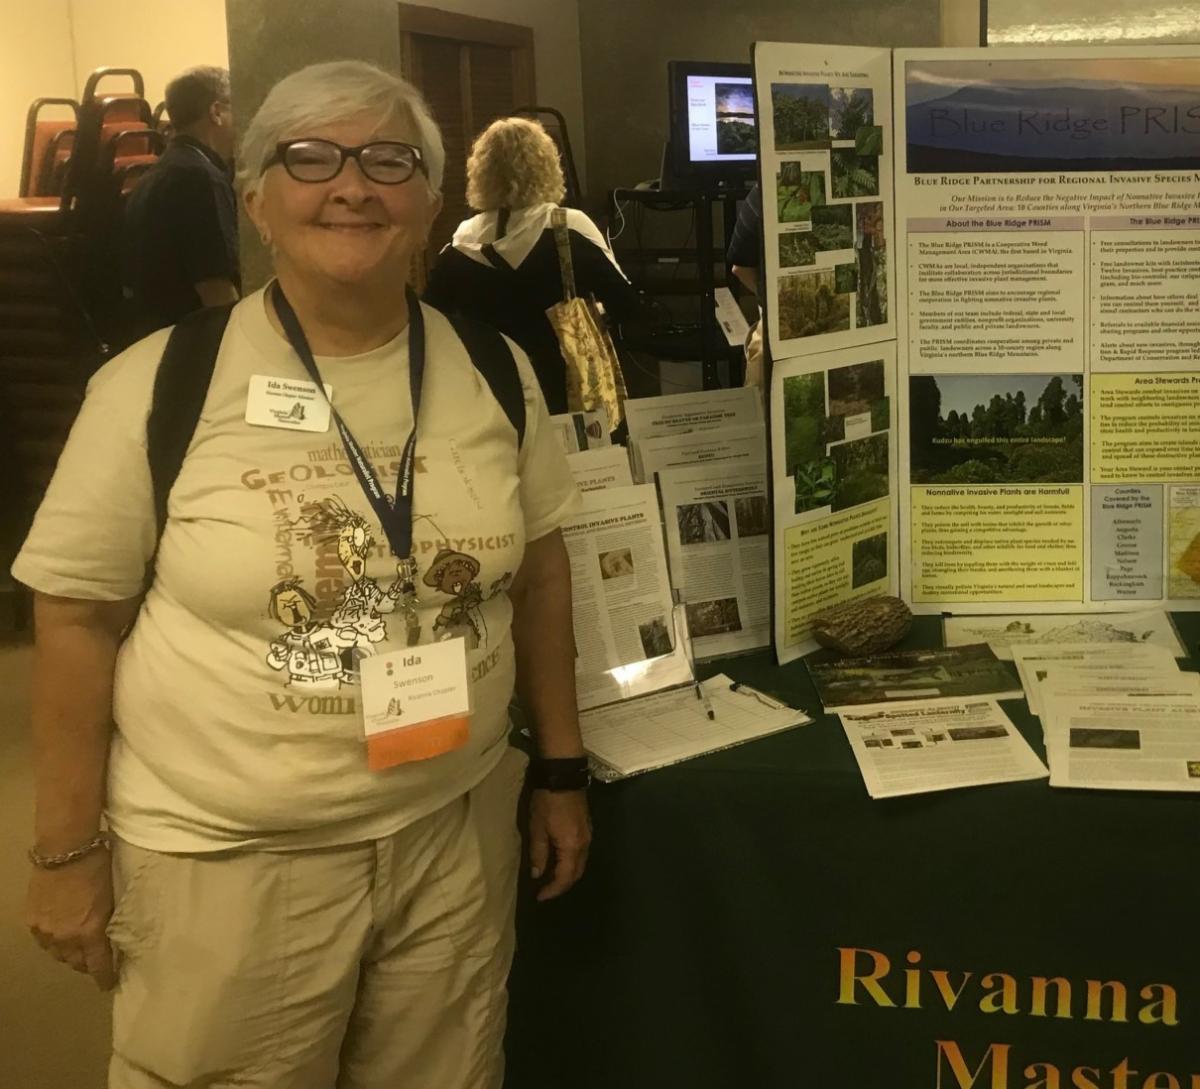 Photo of woman wearing Virginia Master Naturalist nametag, standing next to Rivanna Master Naturalist display table.